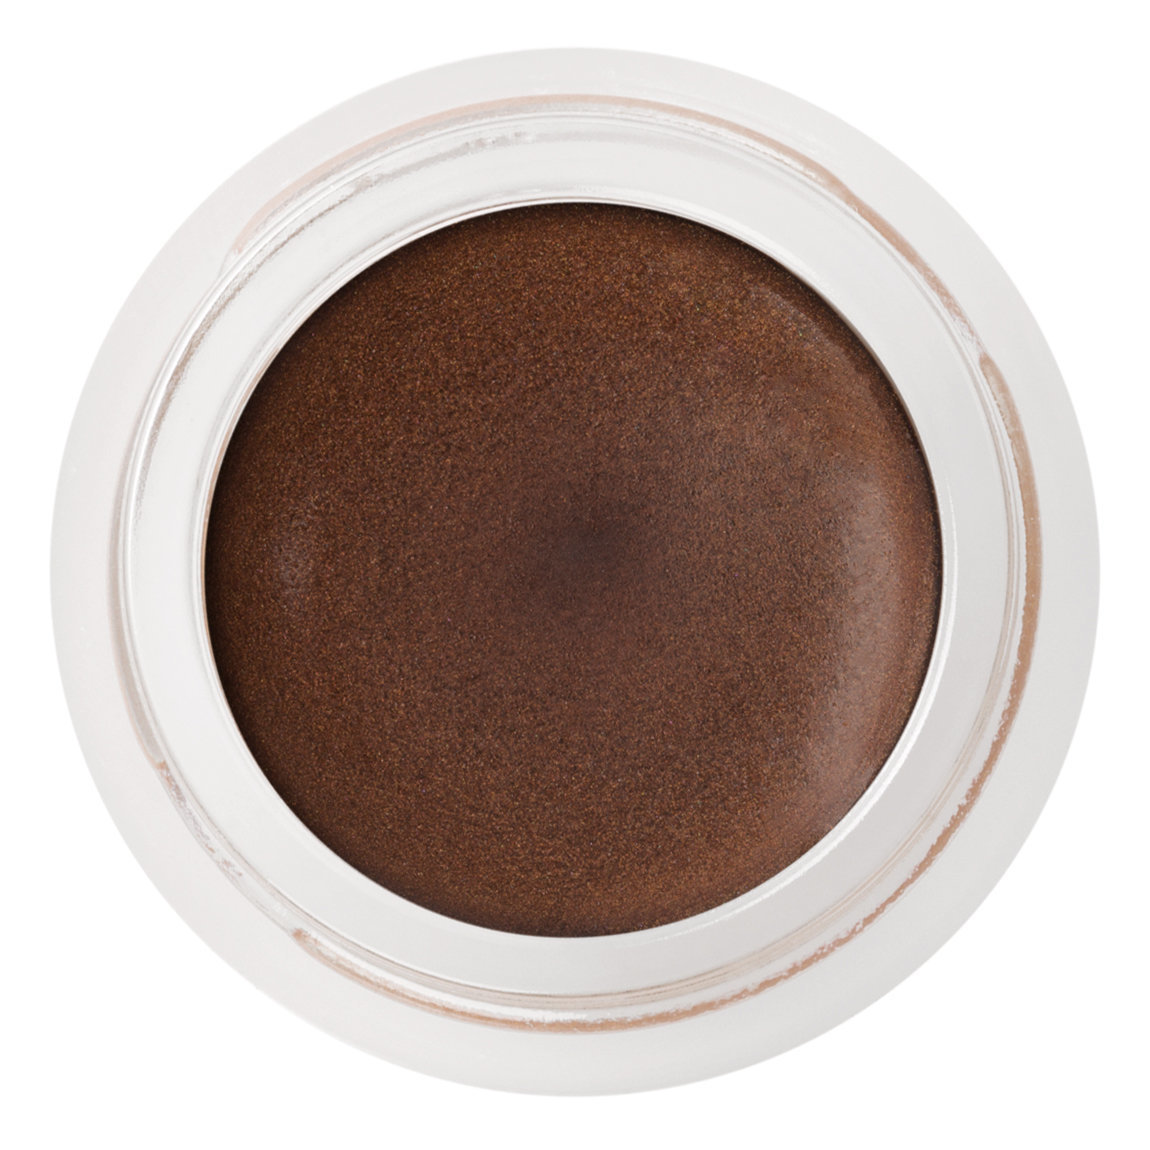 rms beauty Contour Bronze alternative view 1 - product swatch.